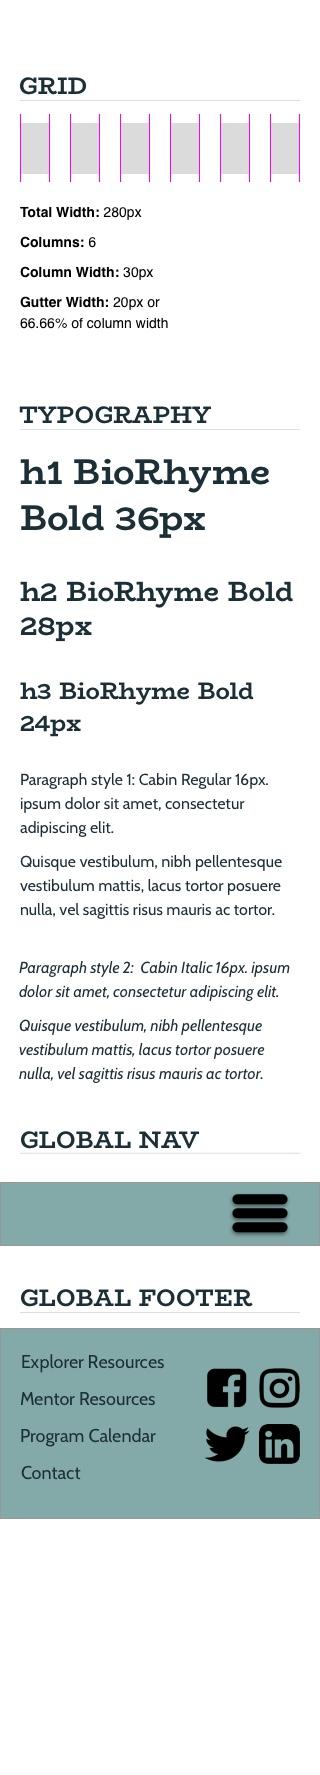 Style Guide Mobile.jpg